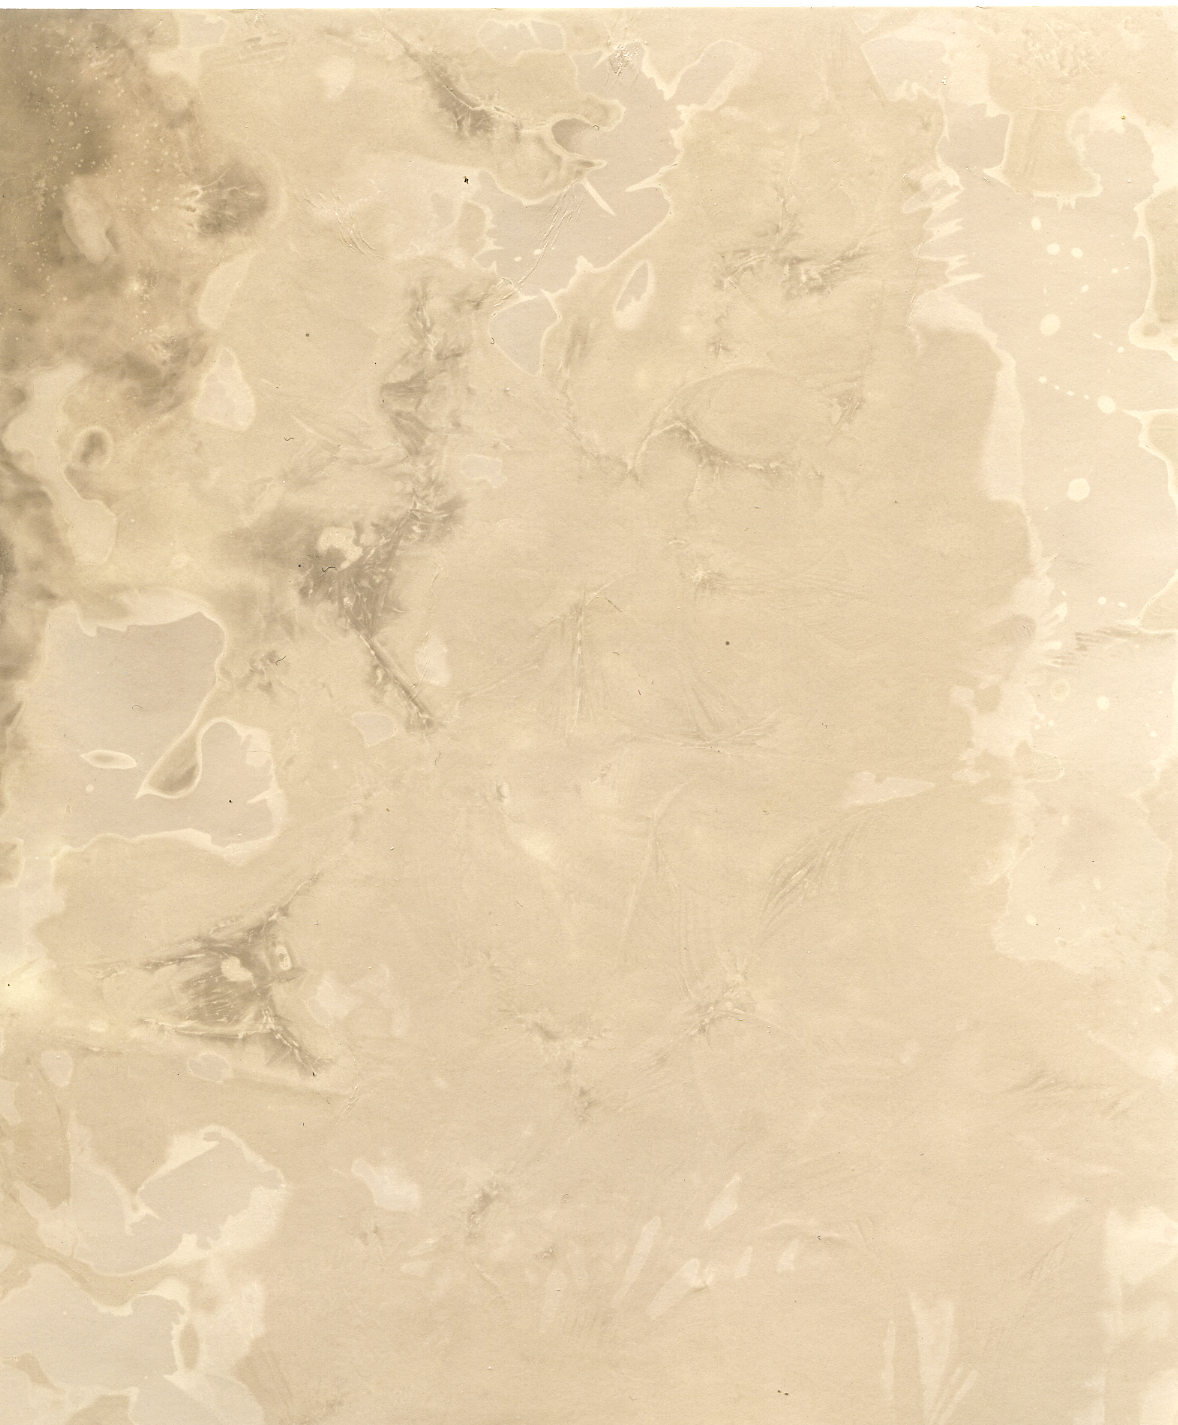 lumen-ice-8.jpg